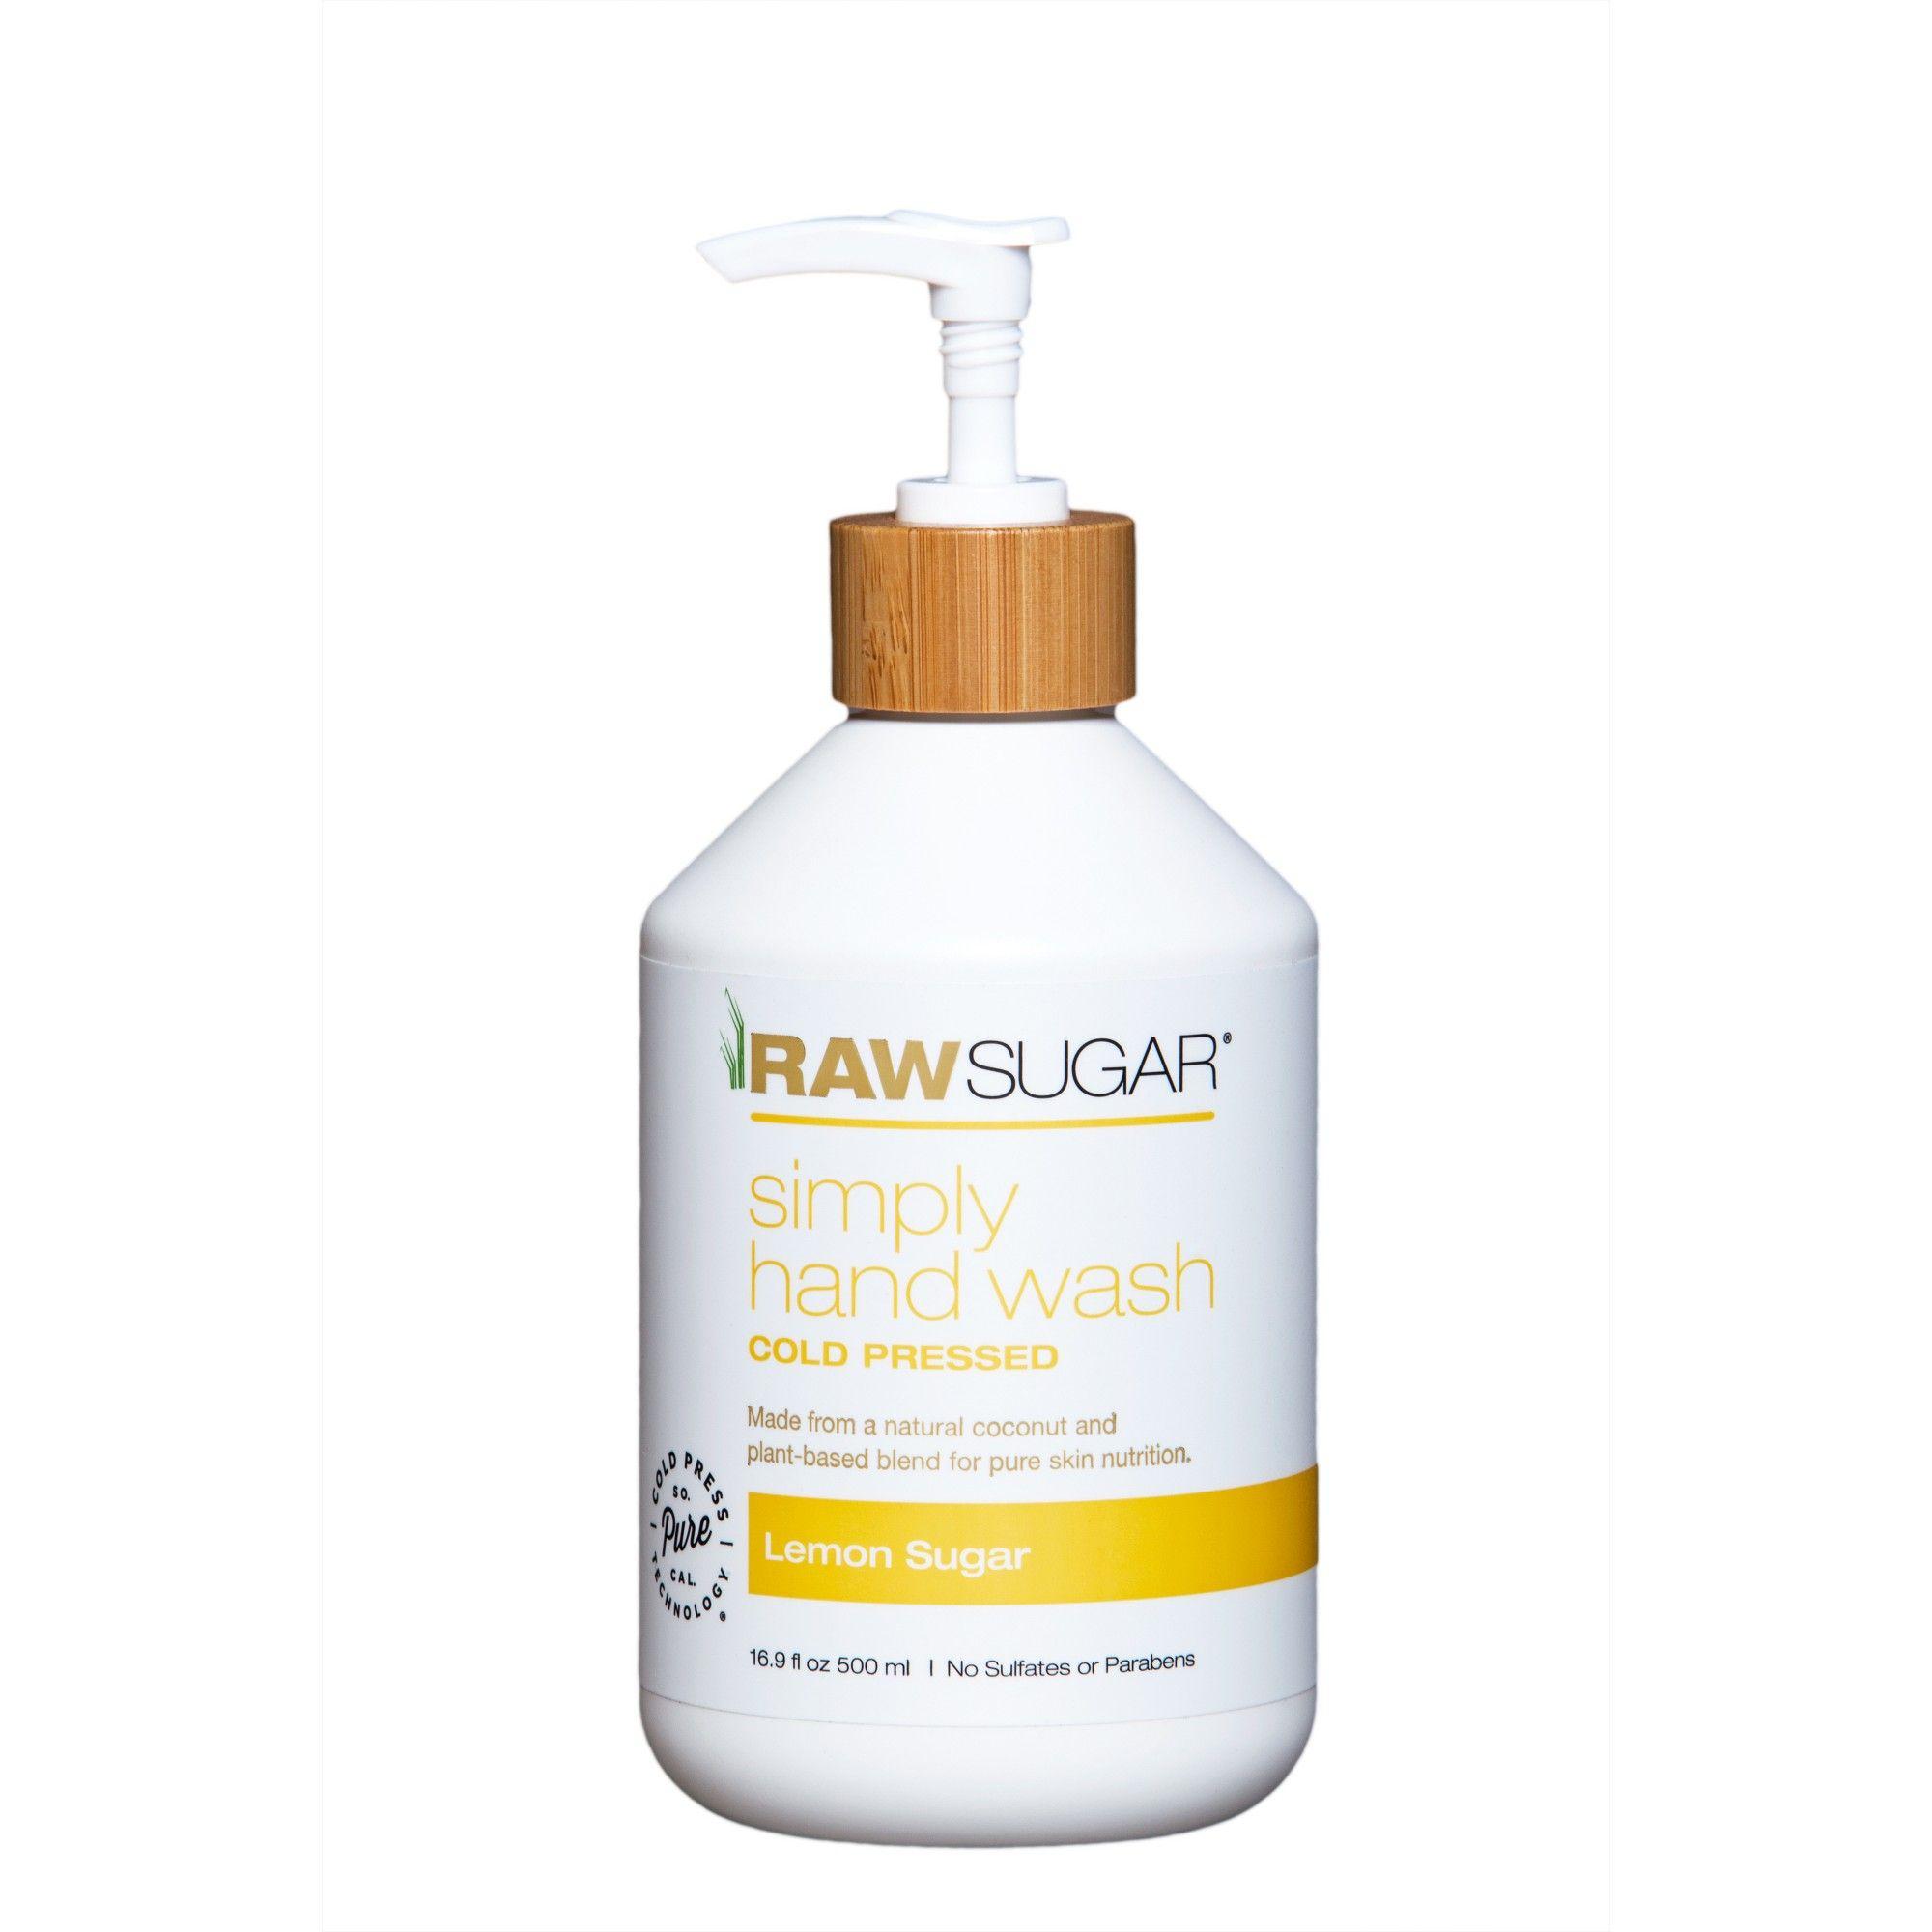 Raw Sugar Simply Hand Wash Lemon Sugar 16 9 Fl Oz Lemon Sugar